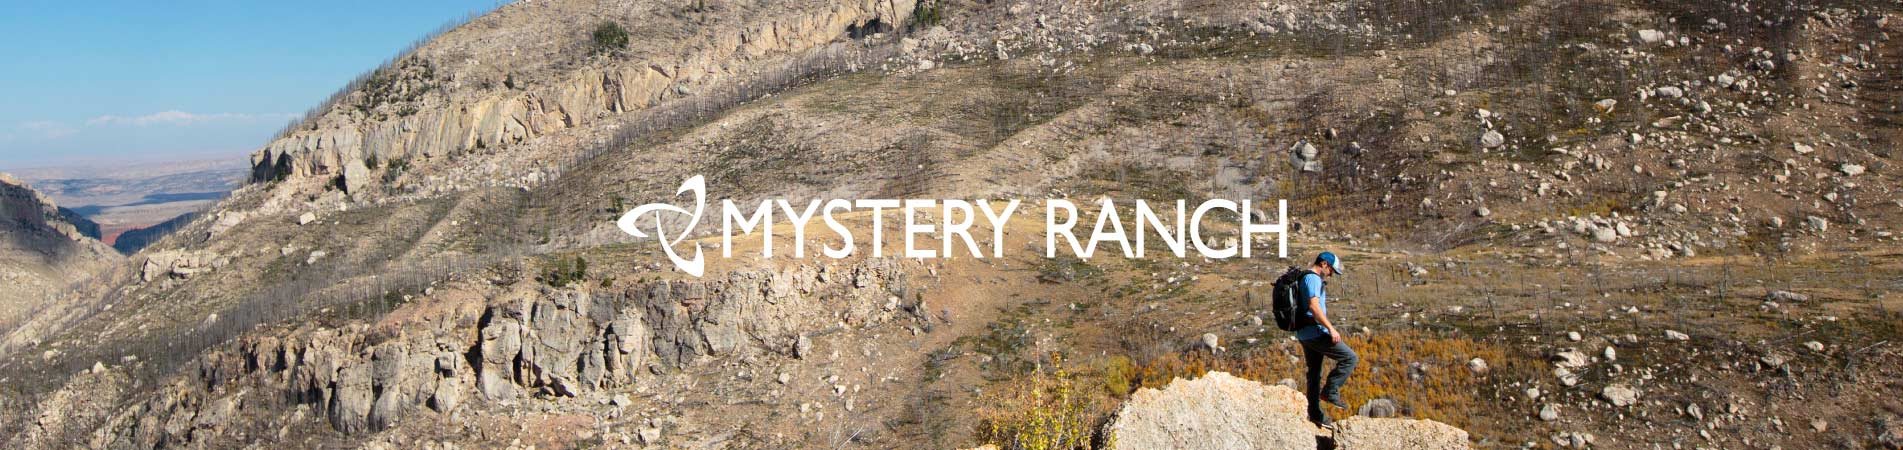 mystery-ranch-brand-banner-v1r3.jpg